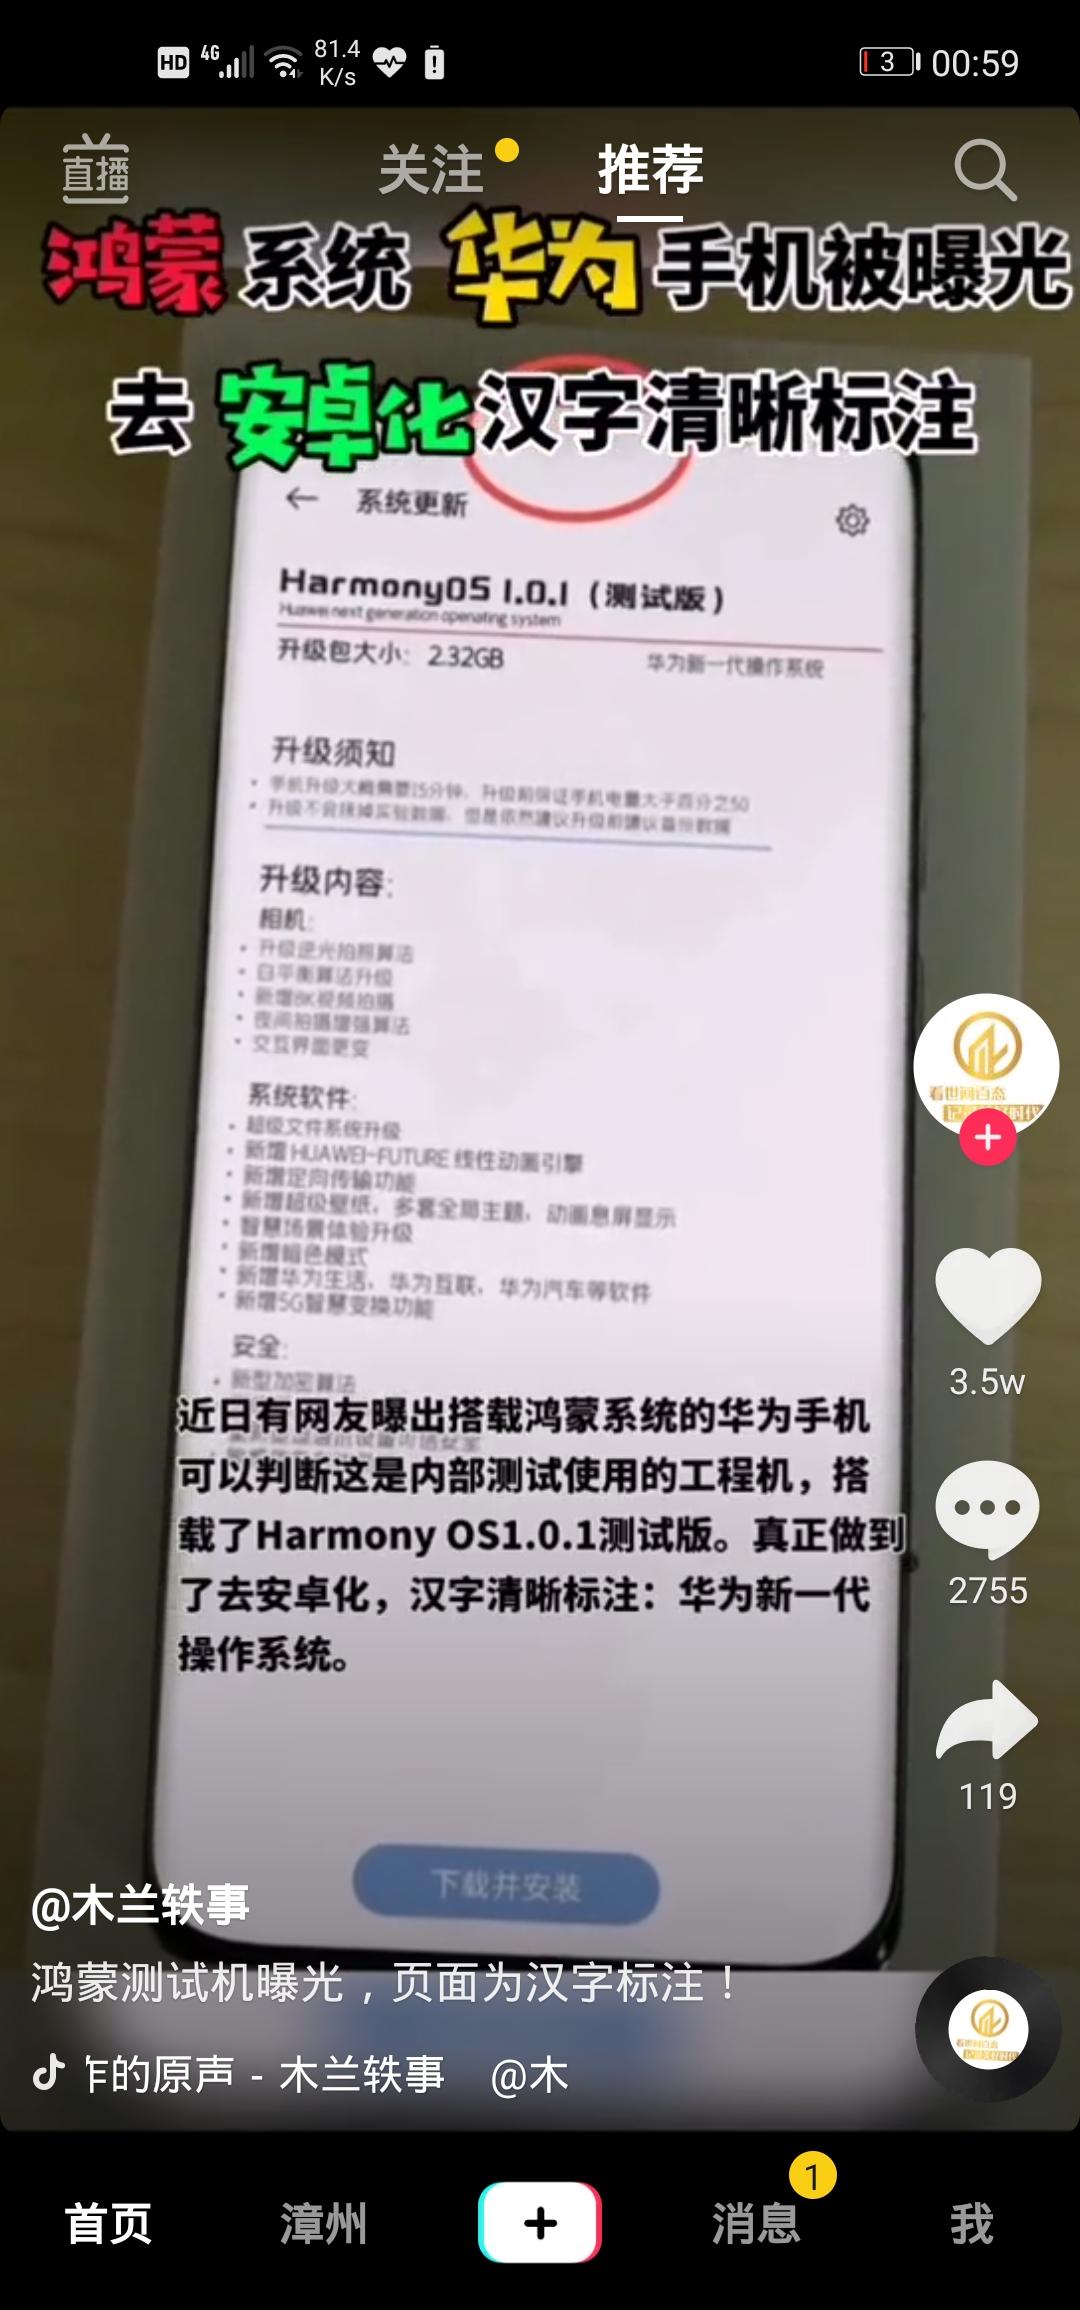 Screenshot_20200509_005940_com.ss.android.ugc.aweme.jpg